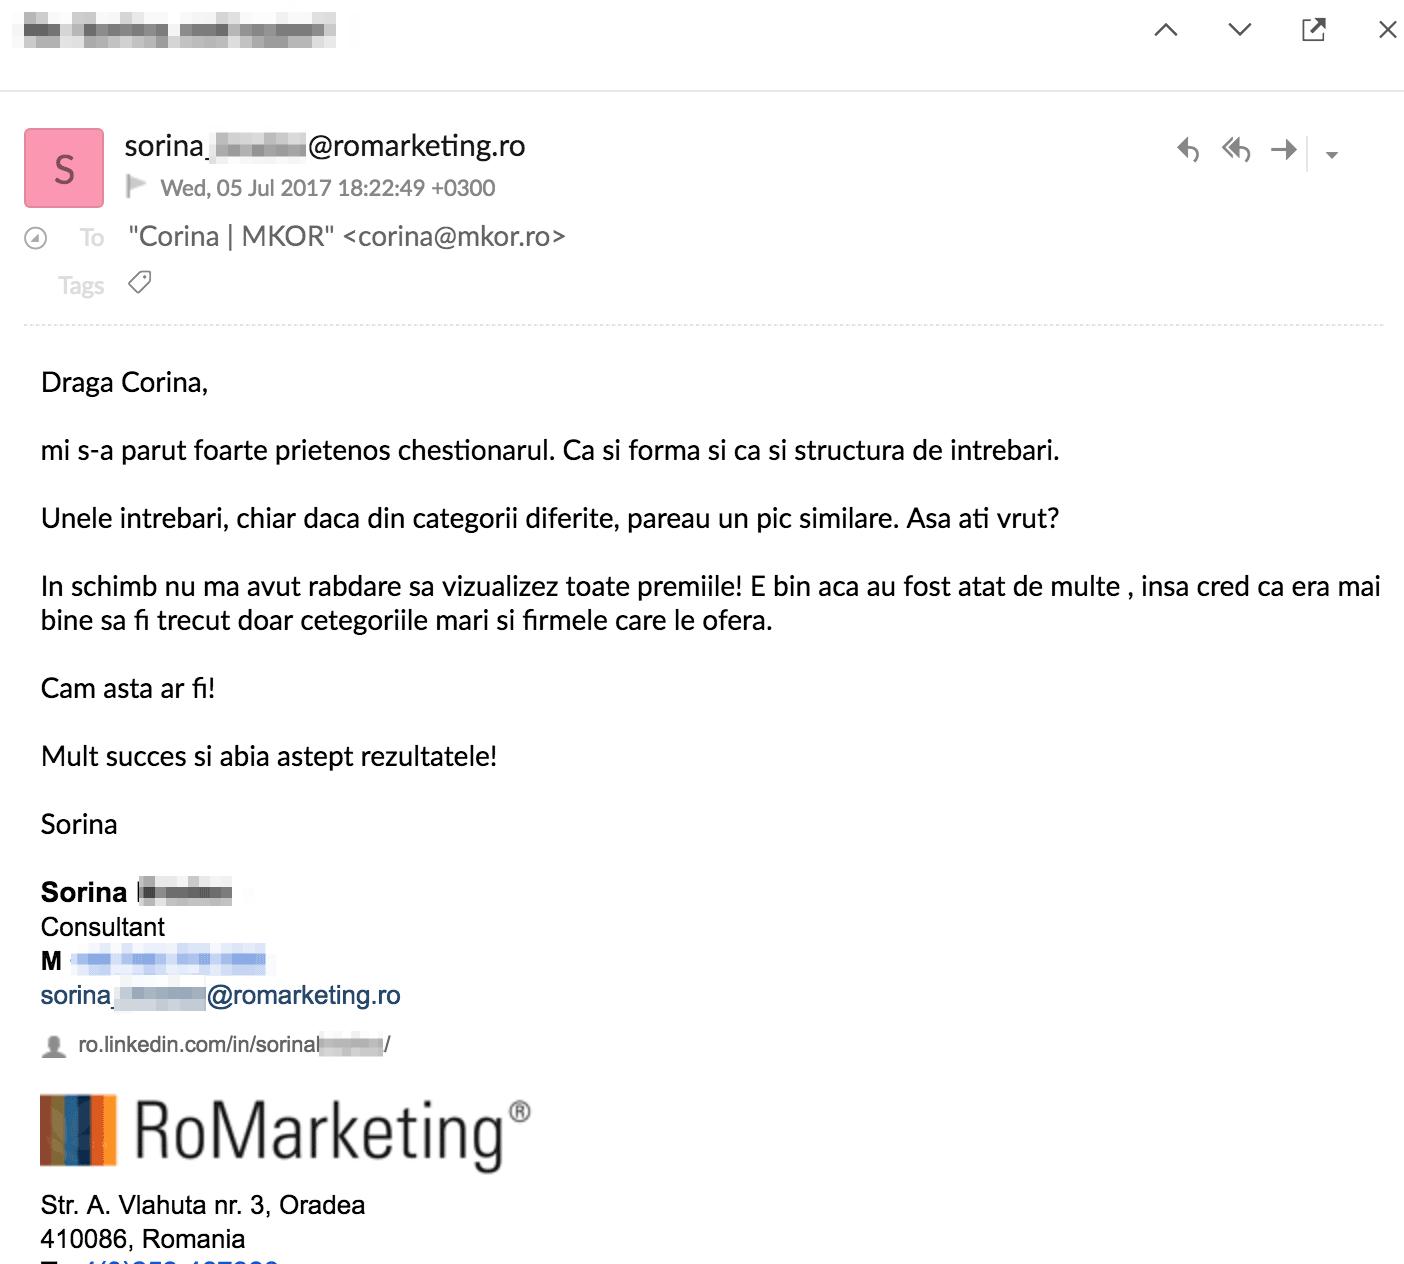 sorina-romarketing-testimonial-email